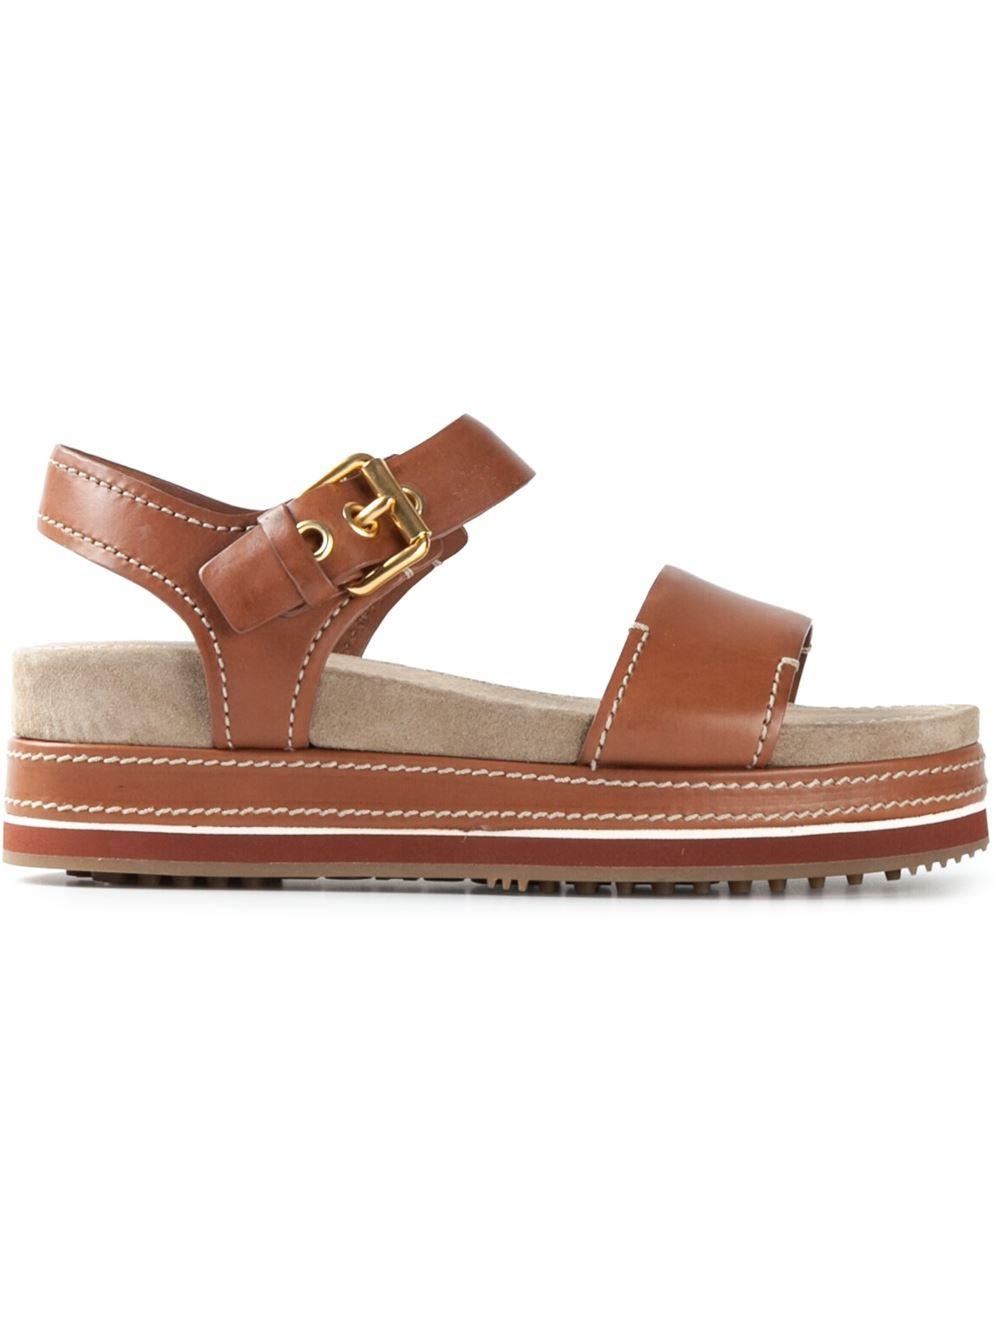 car shoe buckled platform sandals in brown lyst